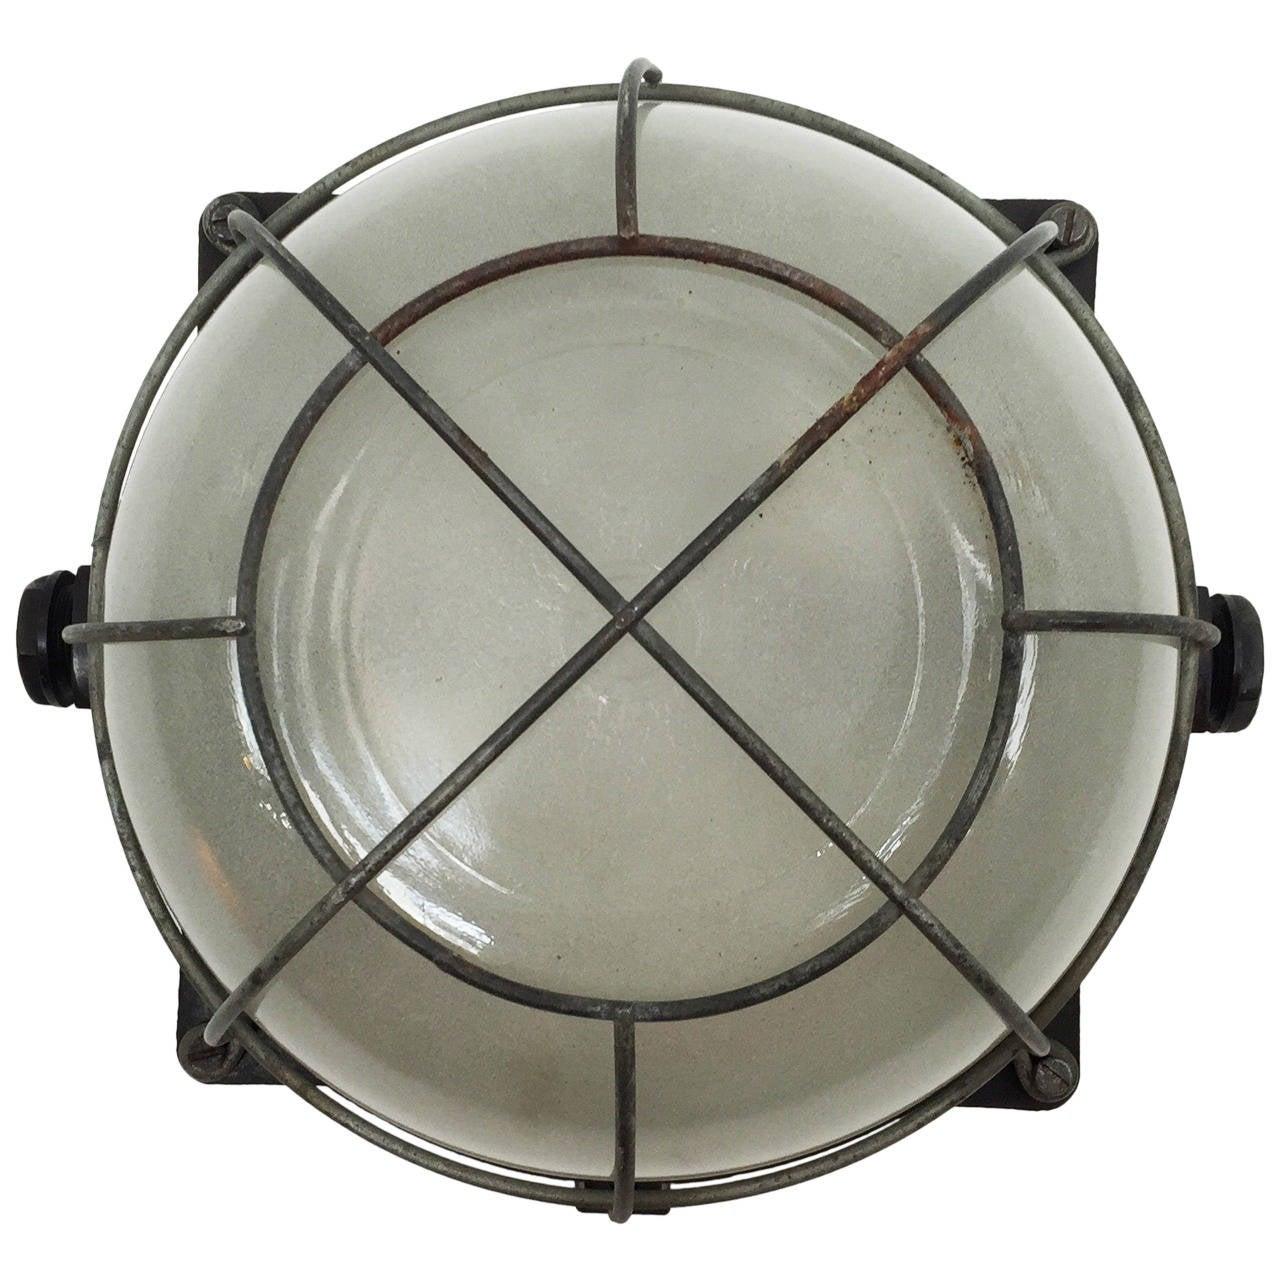 Bakelite Wall or Ceiling Industrial Lamp from 1940s